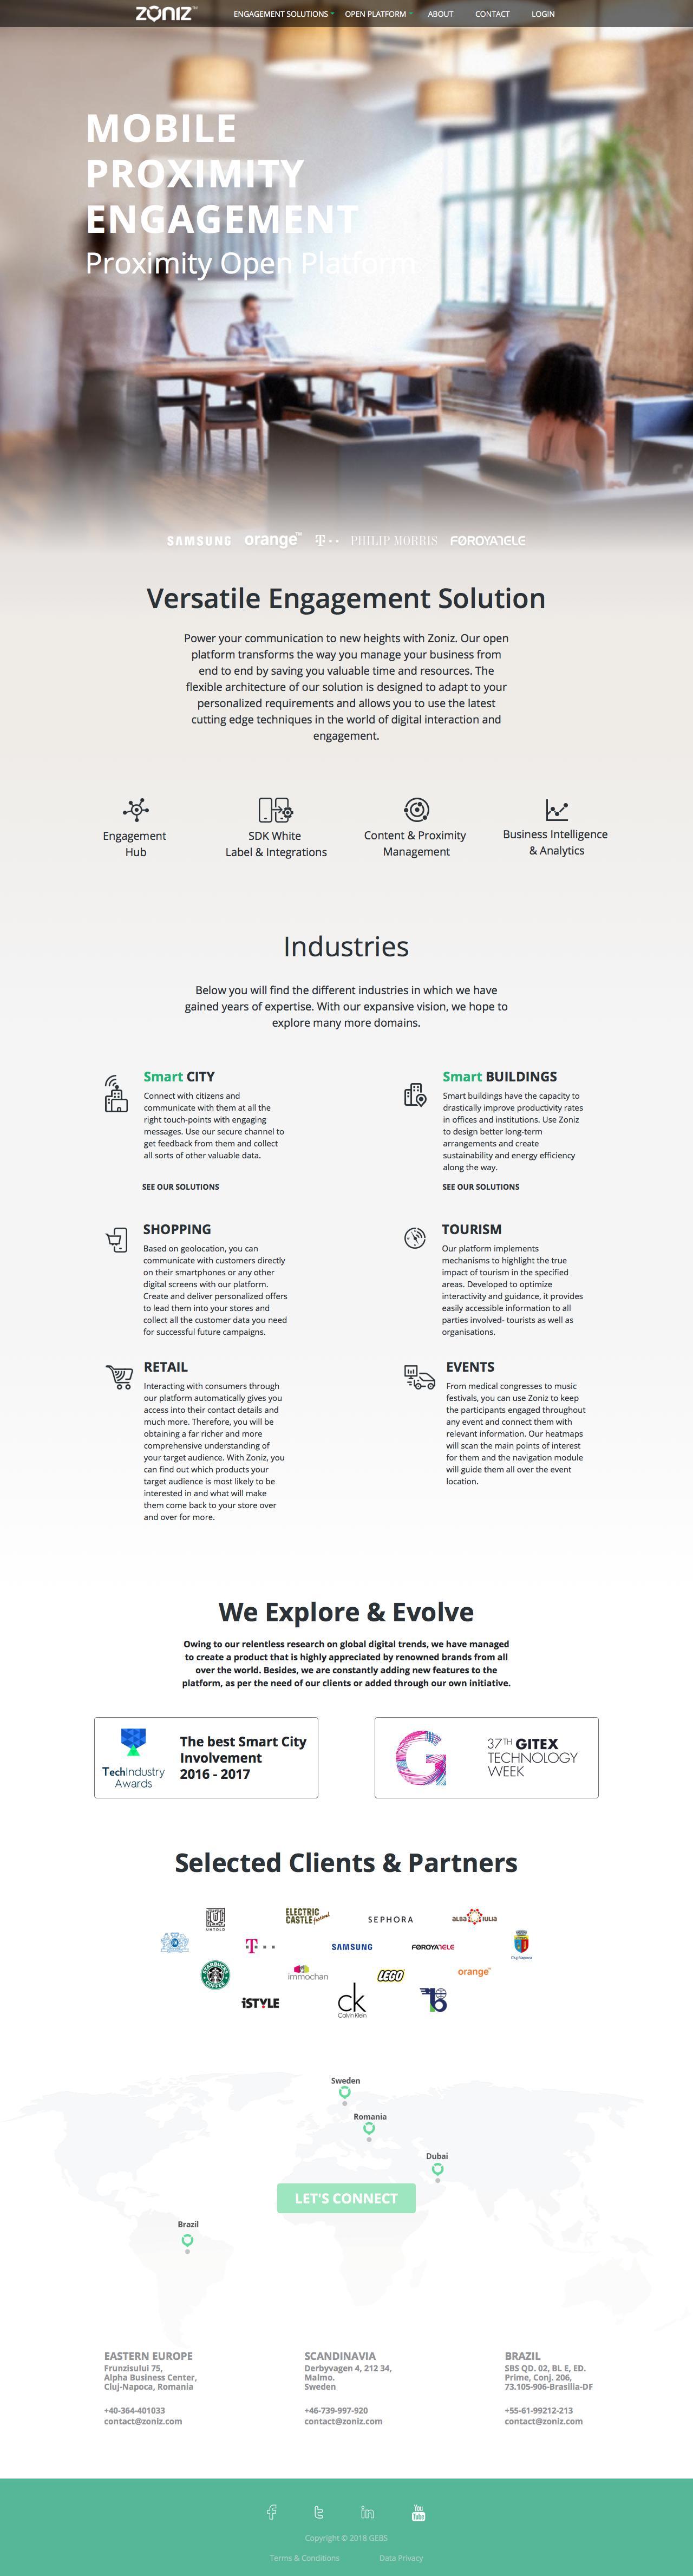 Screenshot of zoniz.com - Mobile Proximity Engagement - Proximity Open Platform - Zoniz Proximity - captured May 26, 2018